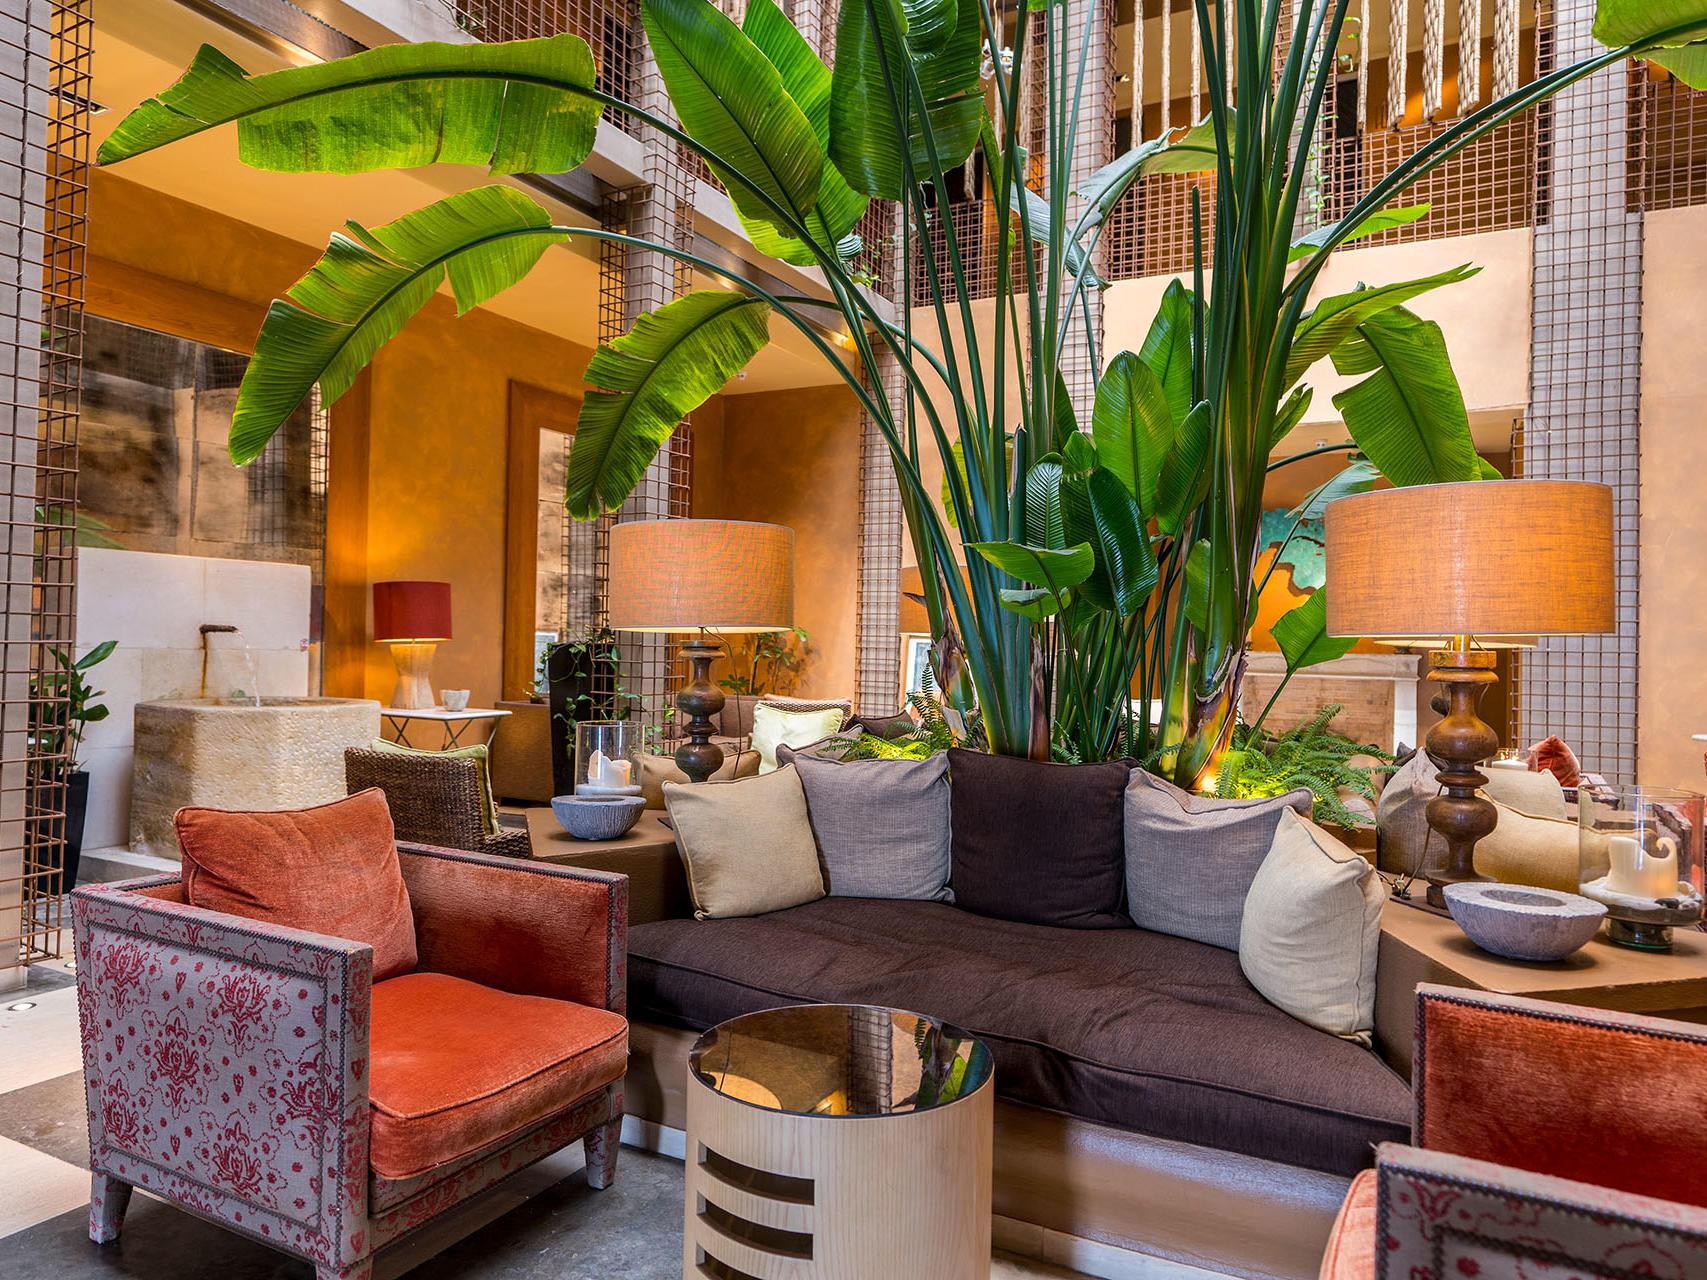 Lobby at Hotel Club Maritimo de Sotogrande, Cádiz, Spain